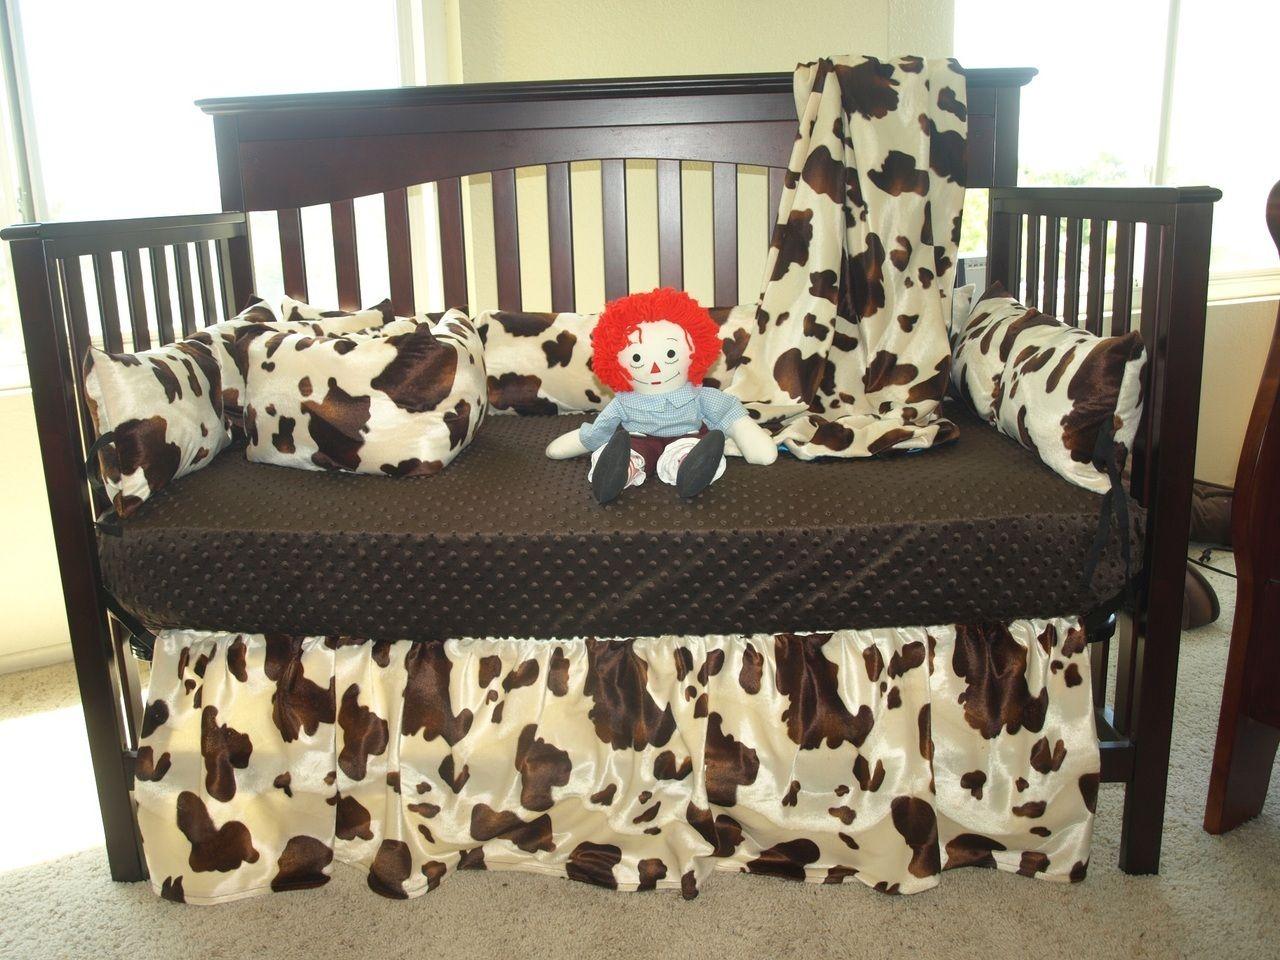 Sew Custom Cow Print Baby Bedding Set 129 00 Http Www